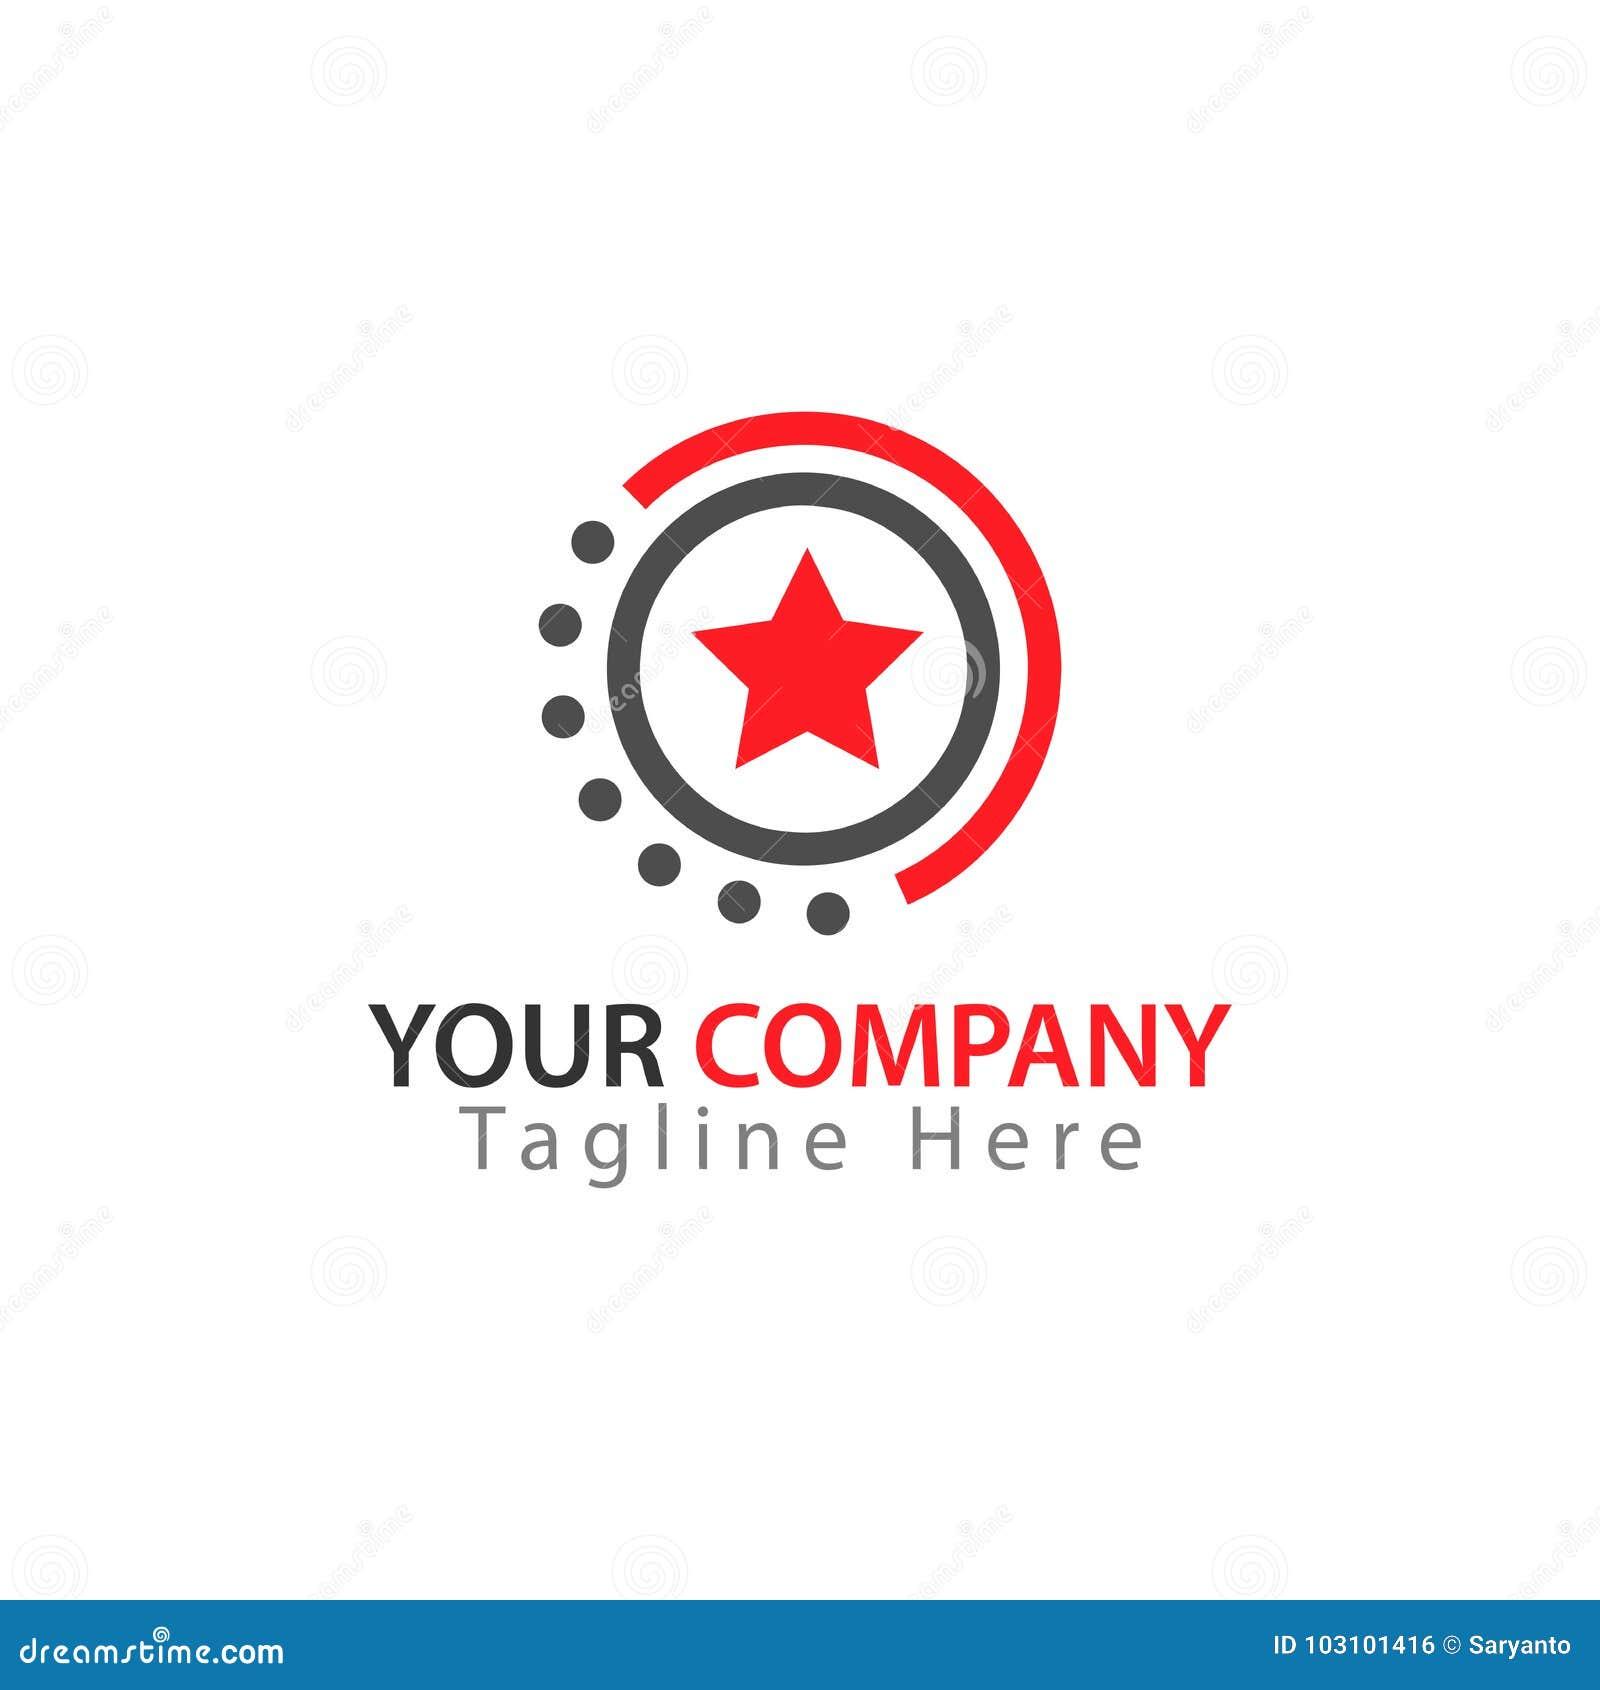 Sternikone im Kreis, Stern Logo Vector